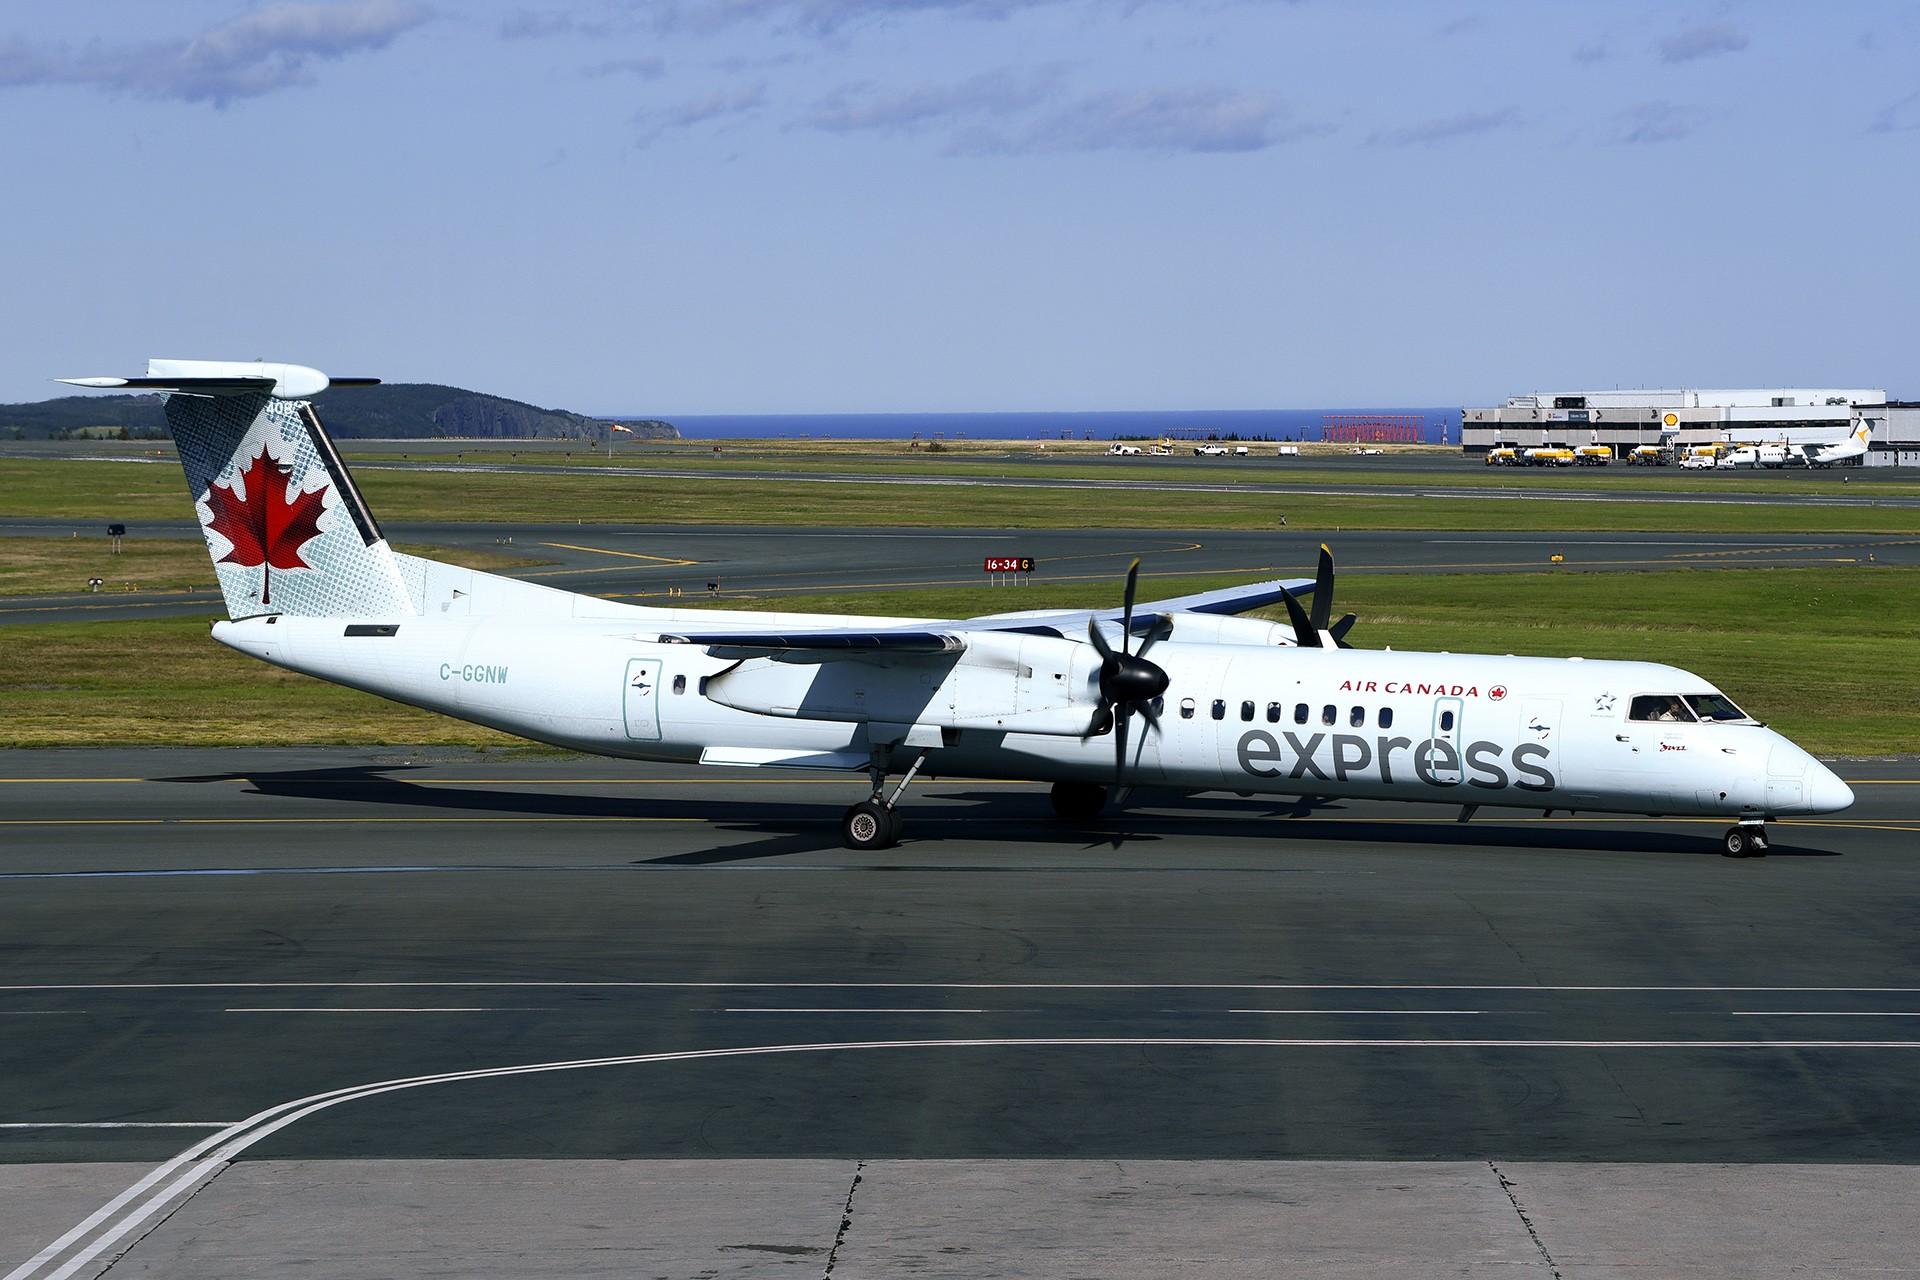 Re:[原创]简易版游记,纪念一次30段的环球飞行和一些碎碎念 BOMBARDIER DASH 8-Q402 C-GGNW St. John's Airport